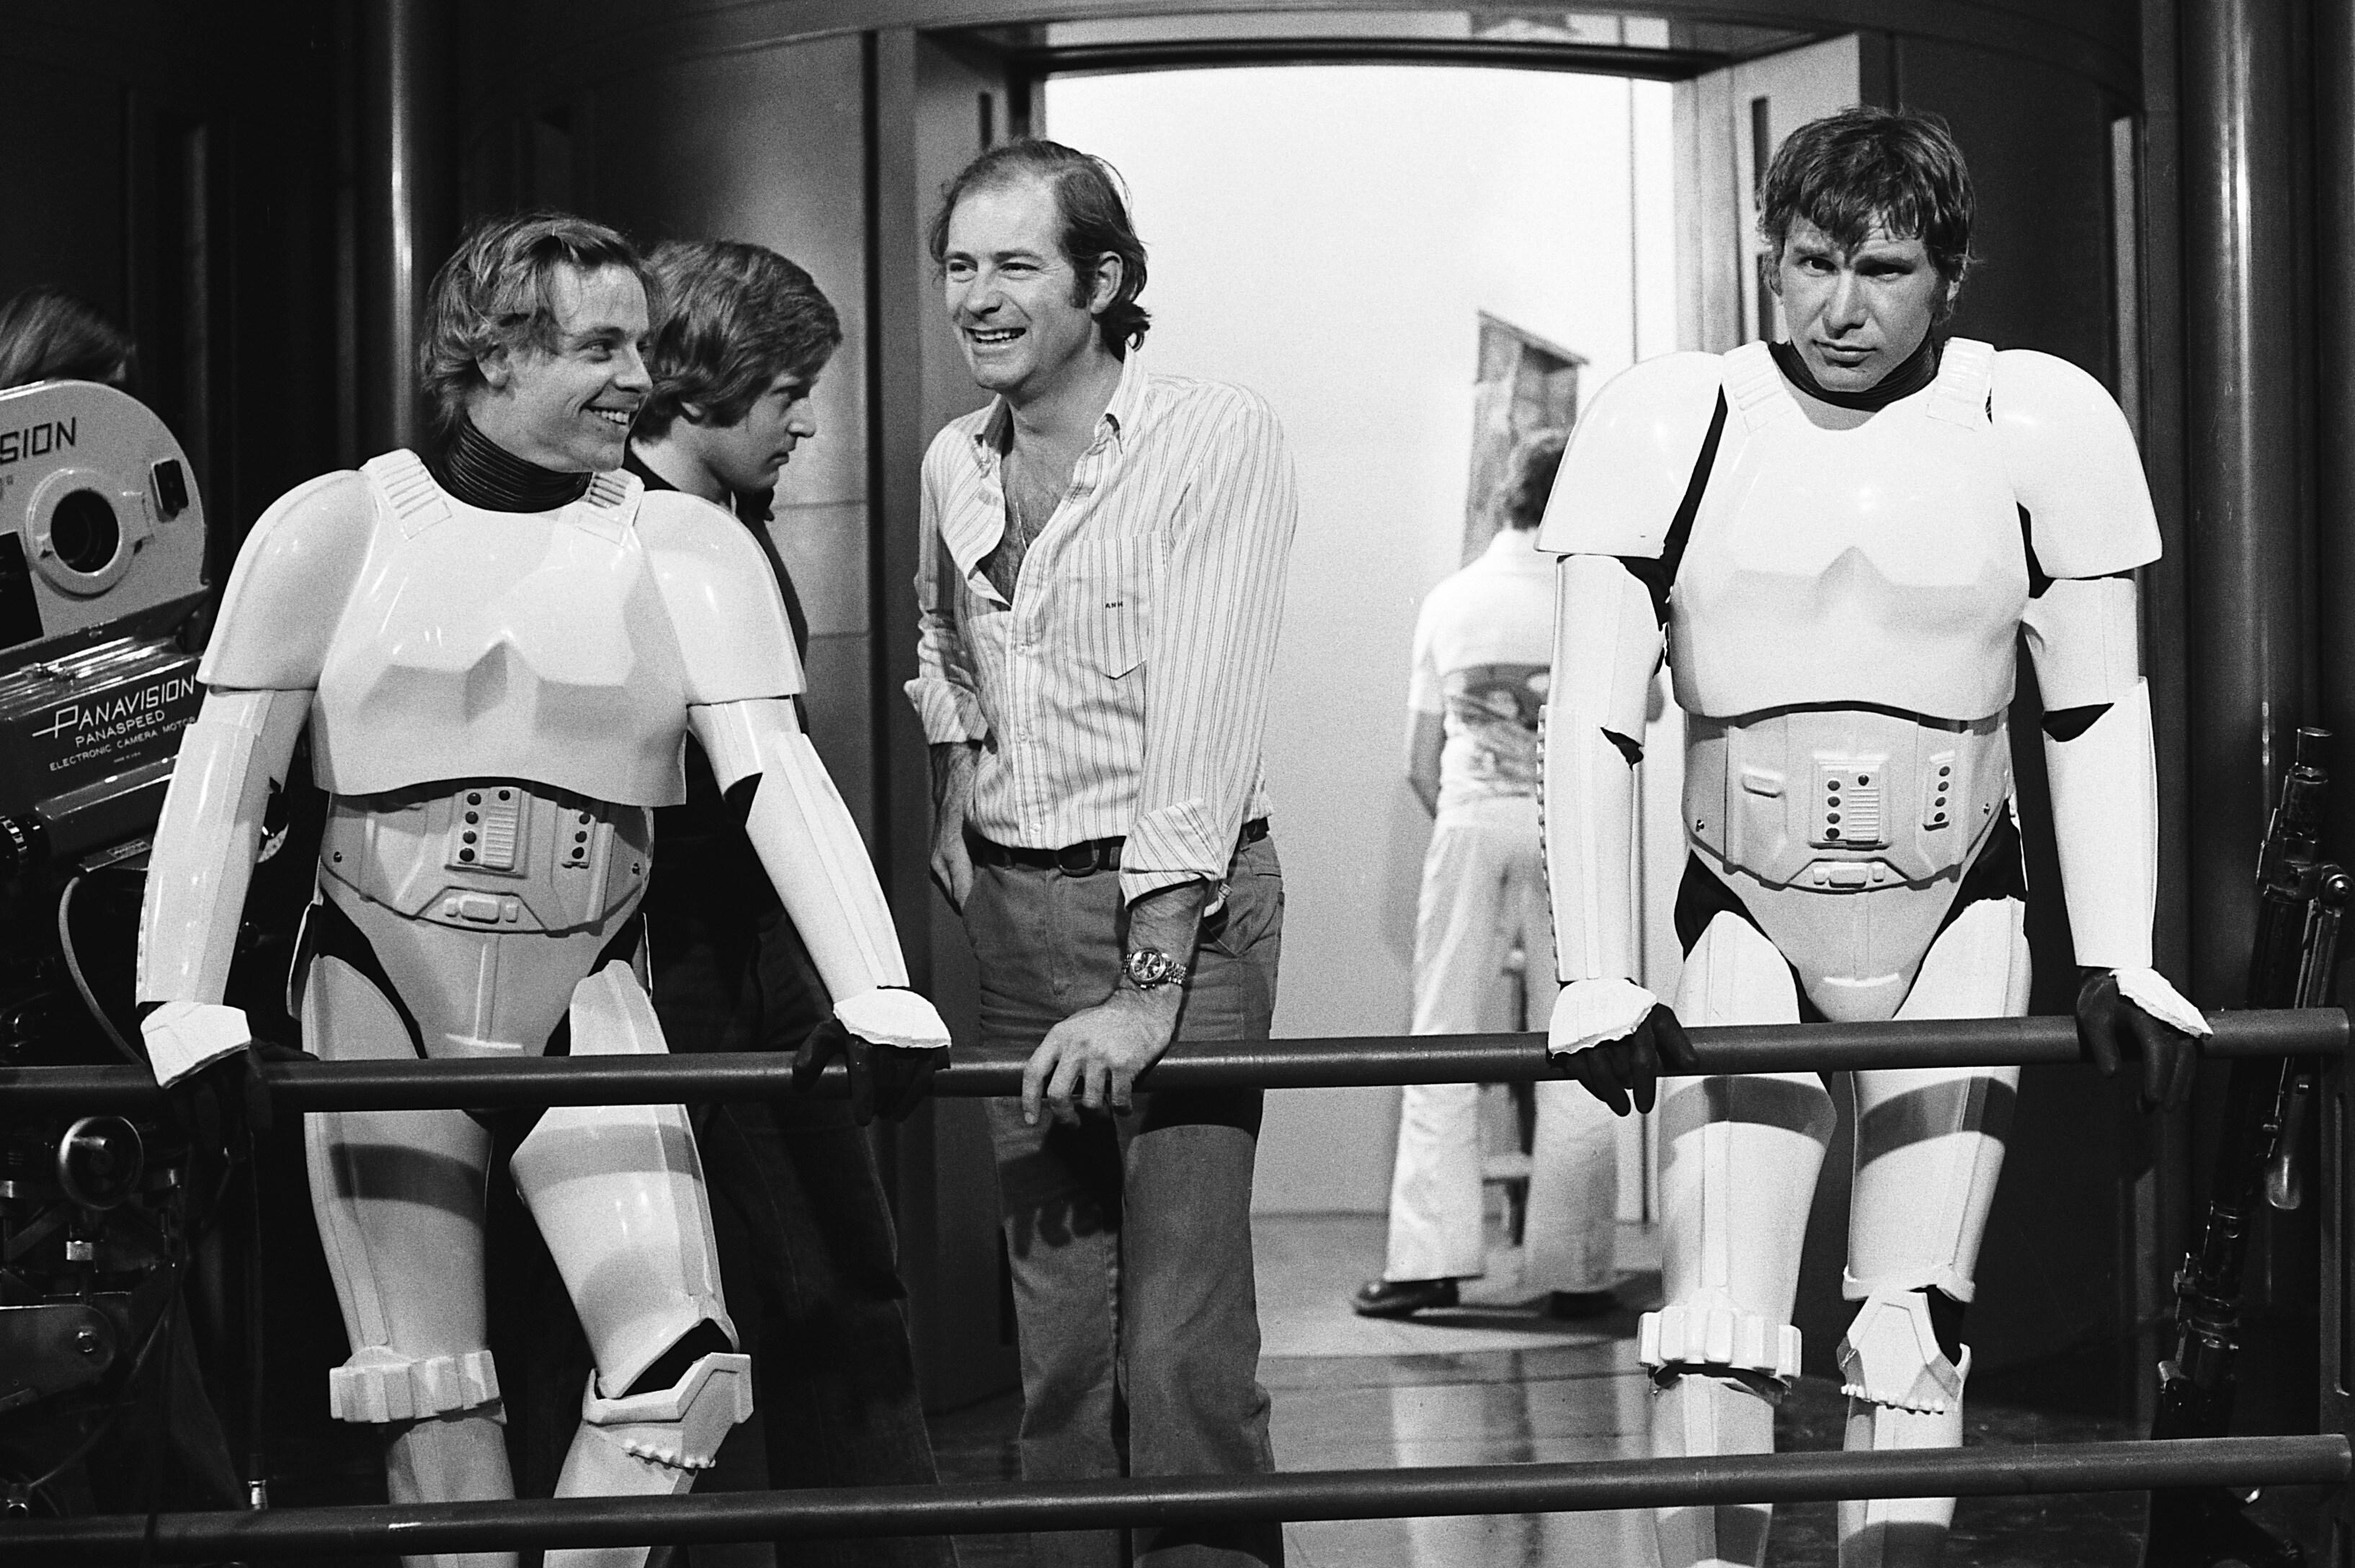 Panavision Camera Star Wars : Star wars a new hope behind the scenes gallery starwars